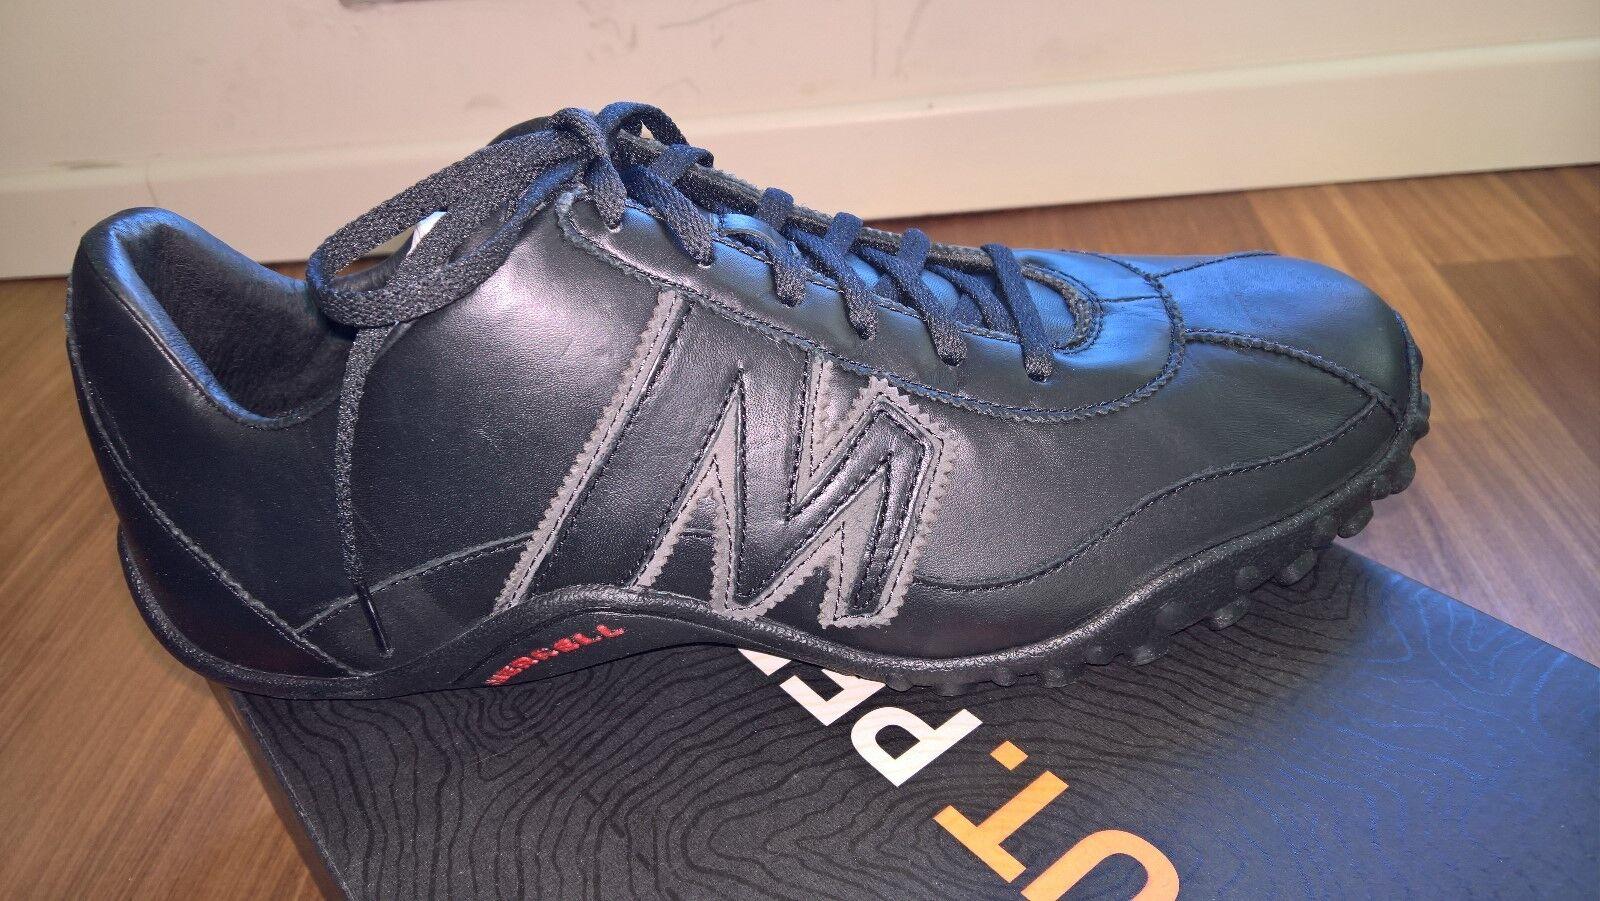 SCARPE MERRELL SPRINT BLAST - nero SCARLET NUOVE - scarpe da ginnastica MERRELL J39149